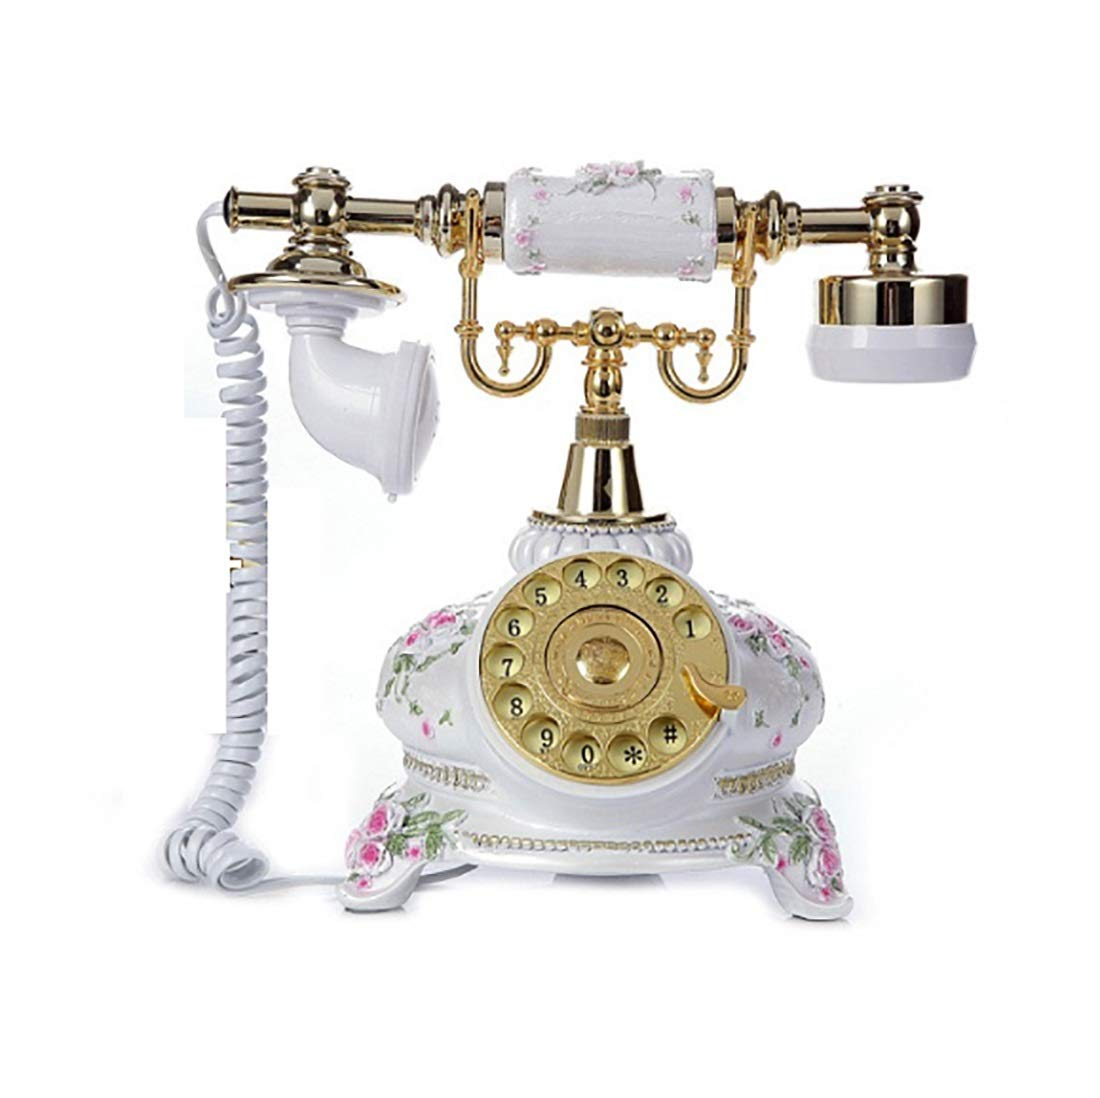 ZHILIAN Classic European Retro Rural Style Home Phone Landline Simple Pattern Dotted Decorative Telephone Line Telephone